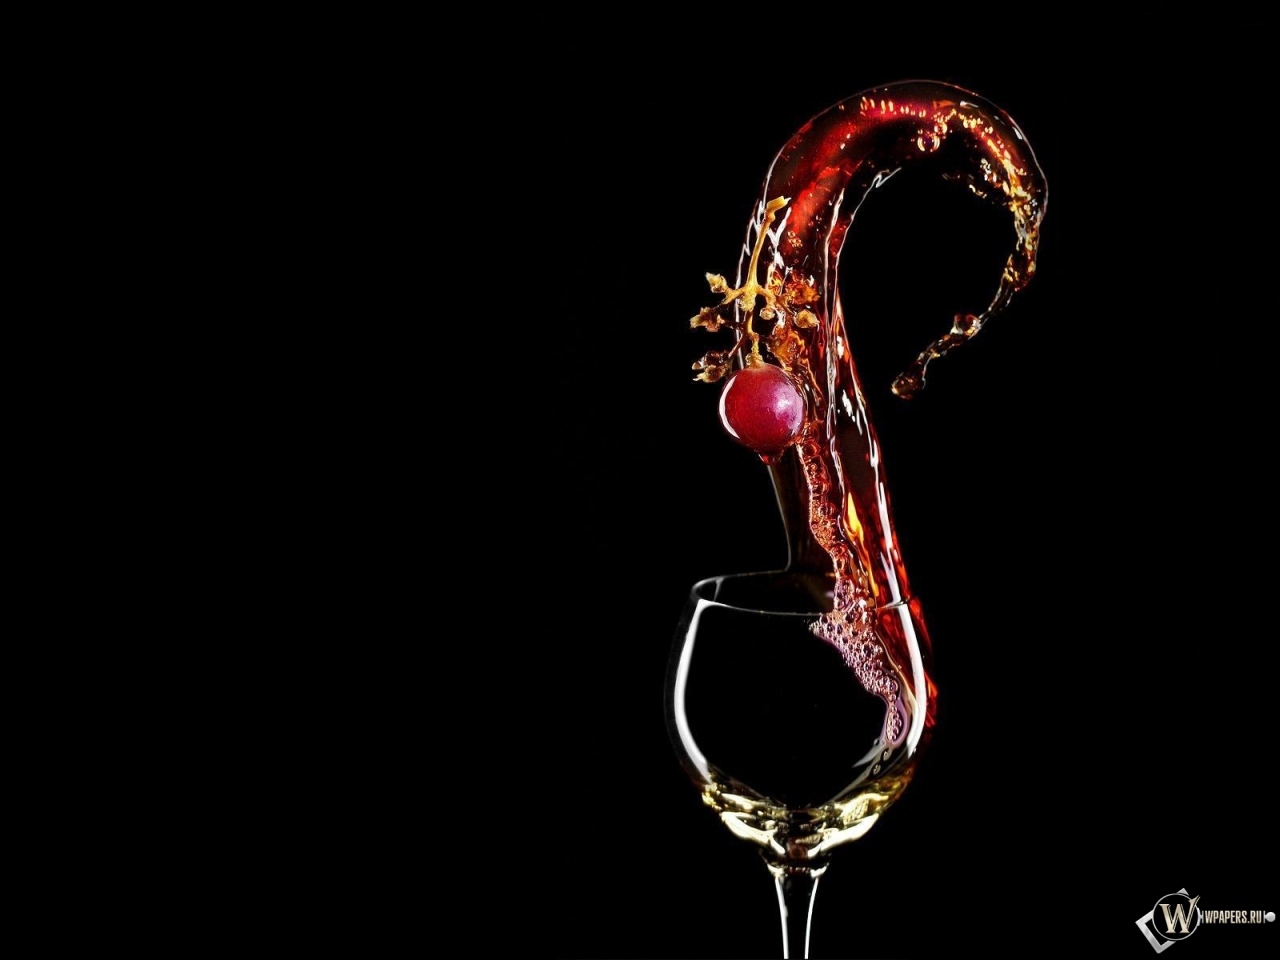 Вино алкоголь бокал 1280x960 картинки